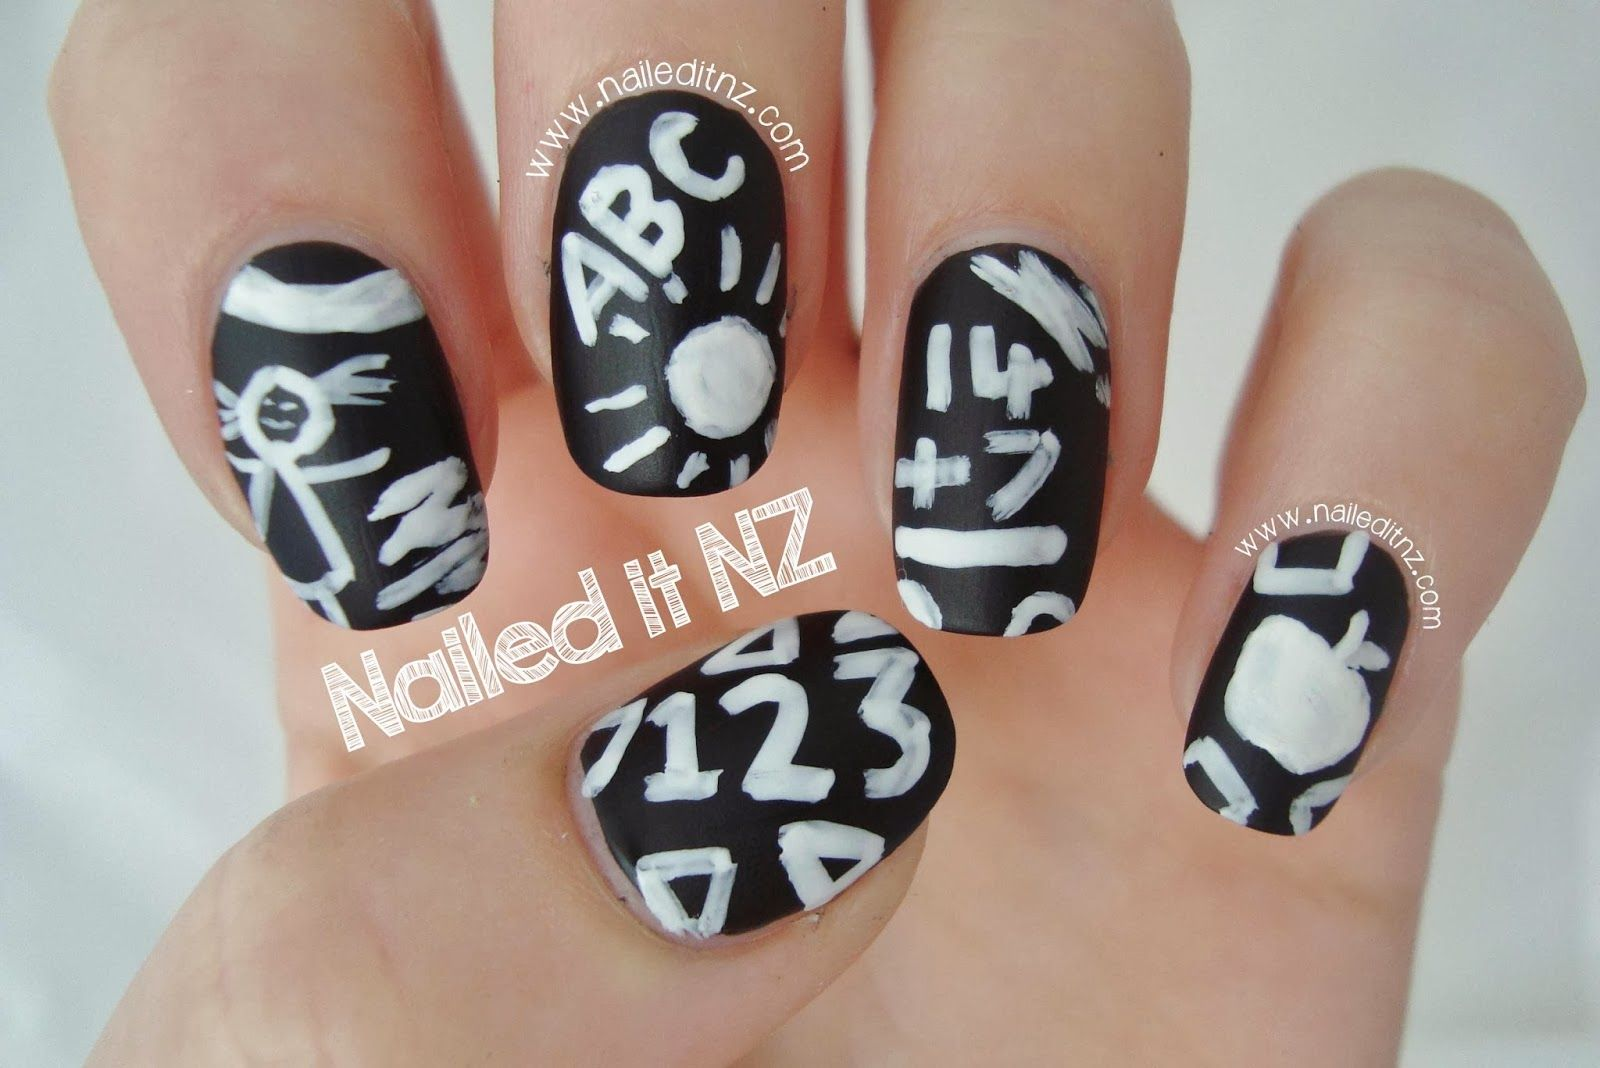 Nailed It Nz Revlon Nail Art Chalkboard Nails Nails Art